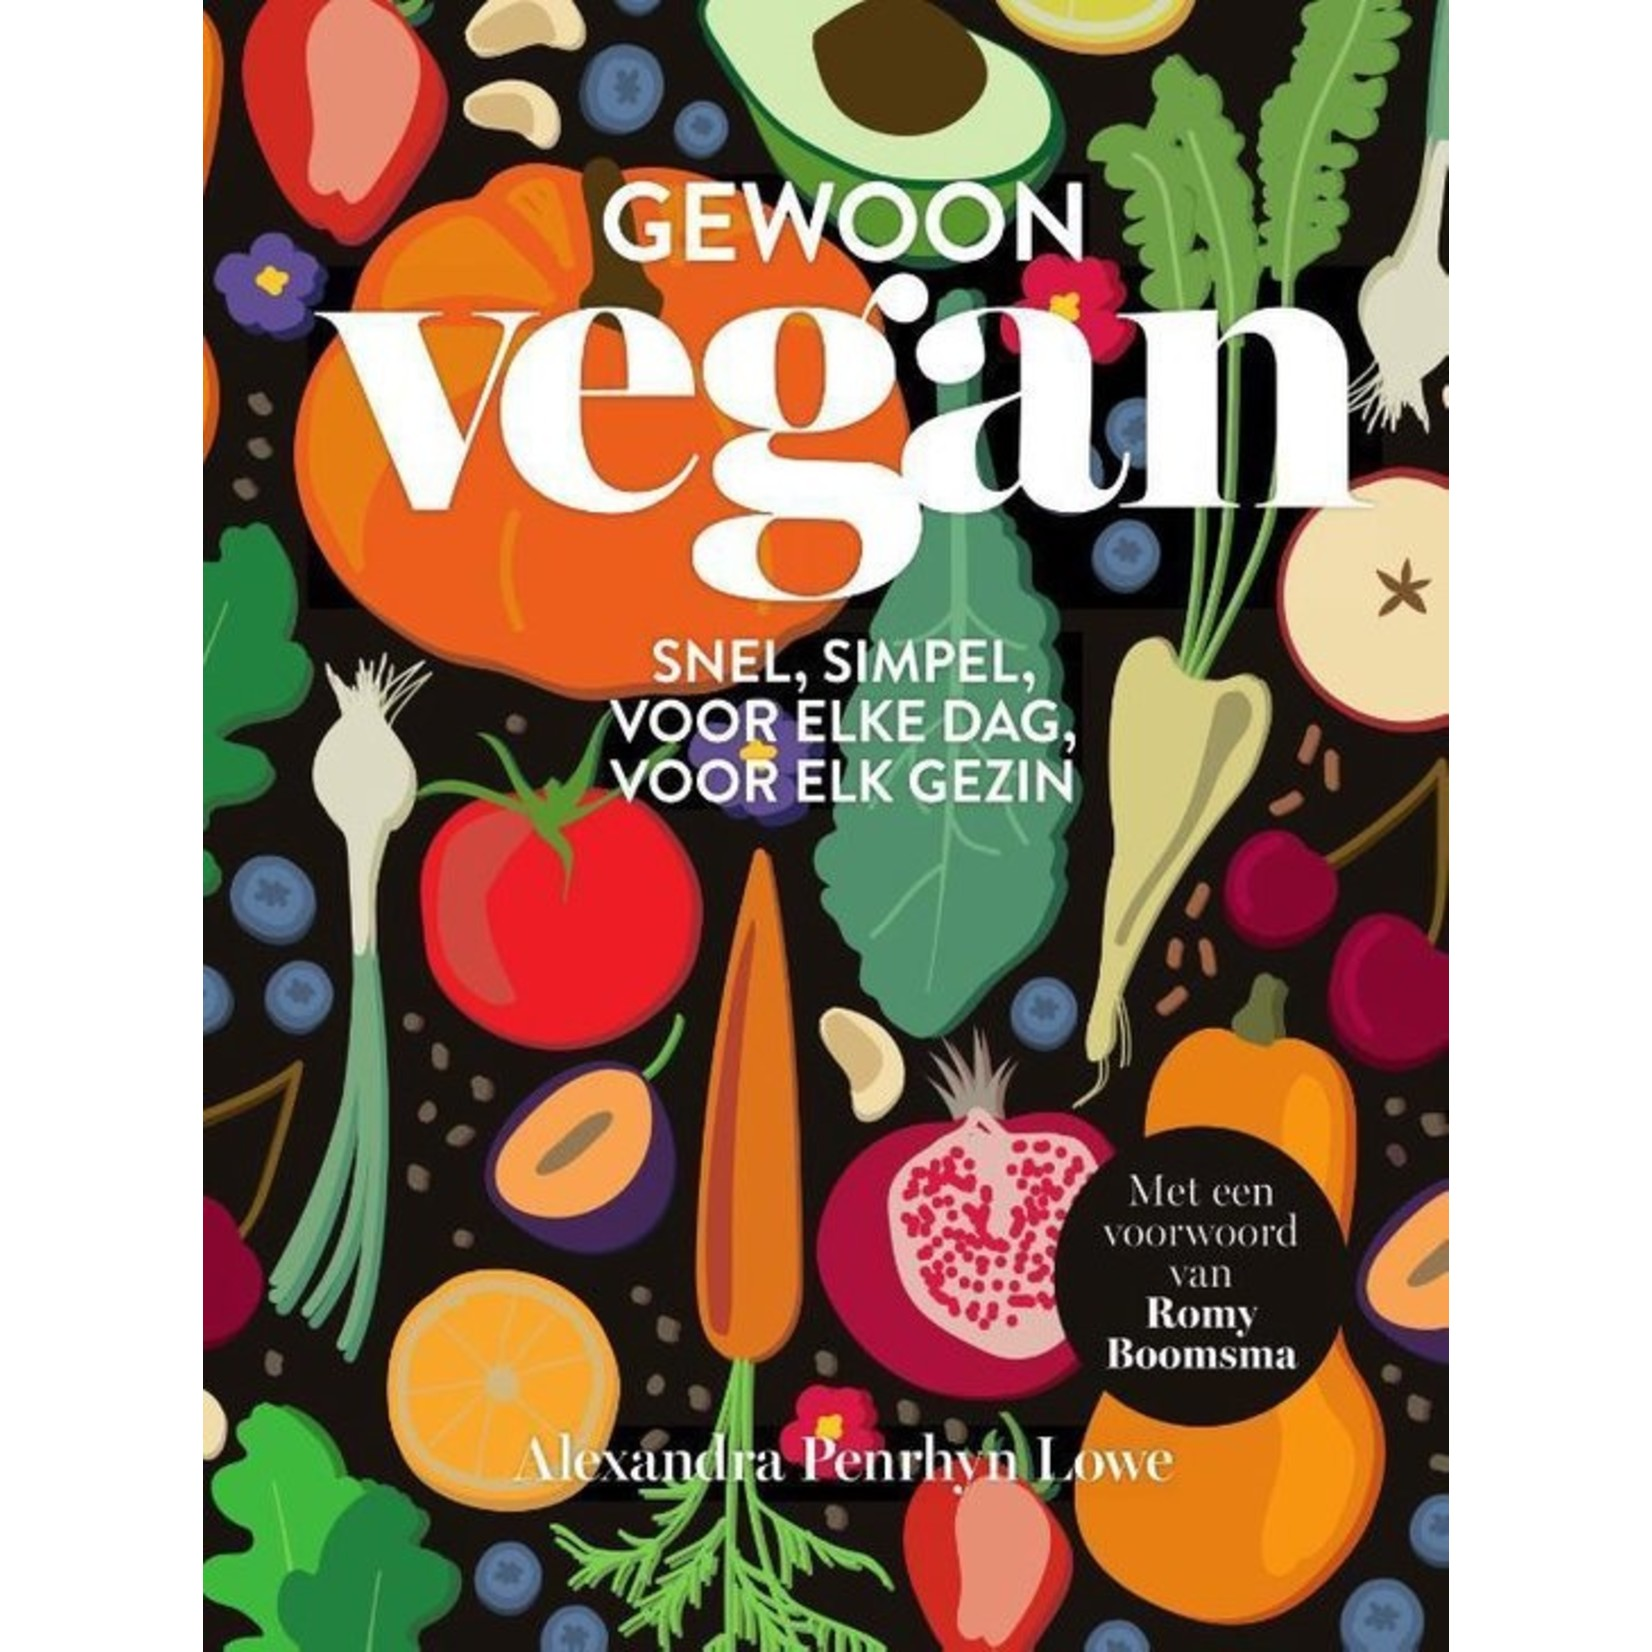 Gewoon vegan kookboek